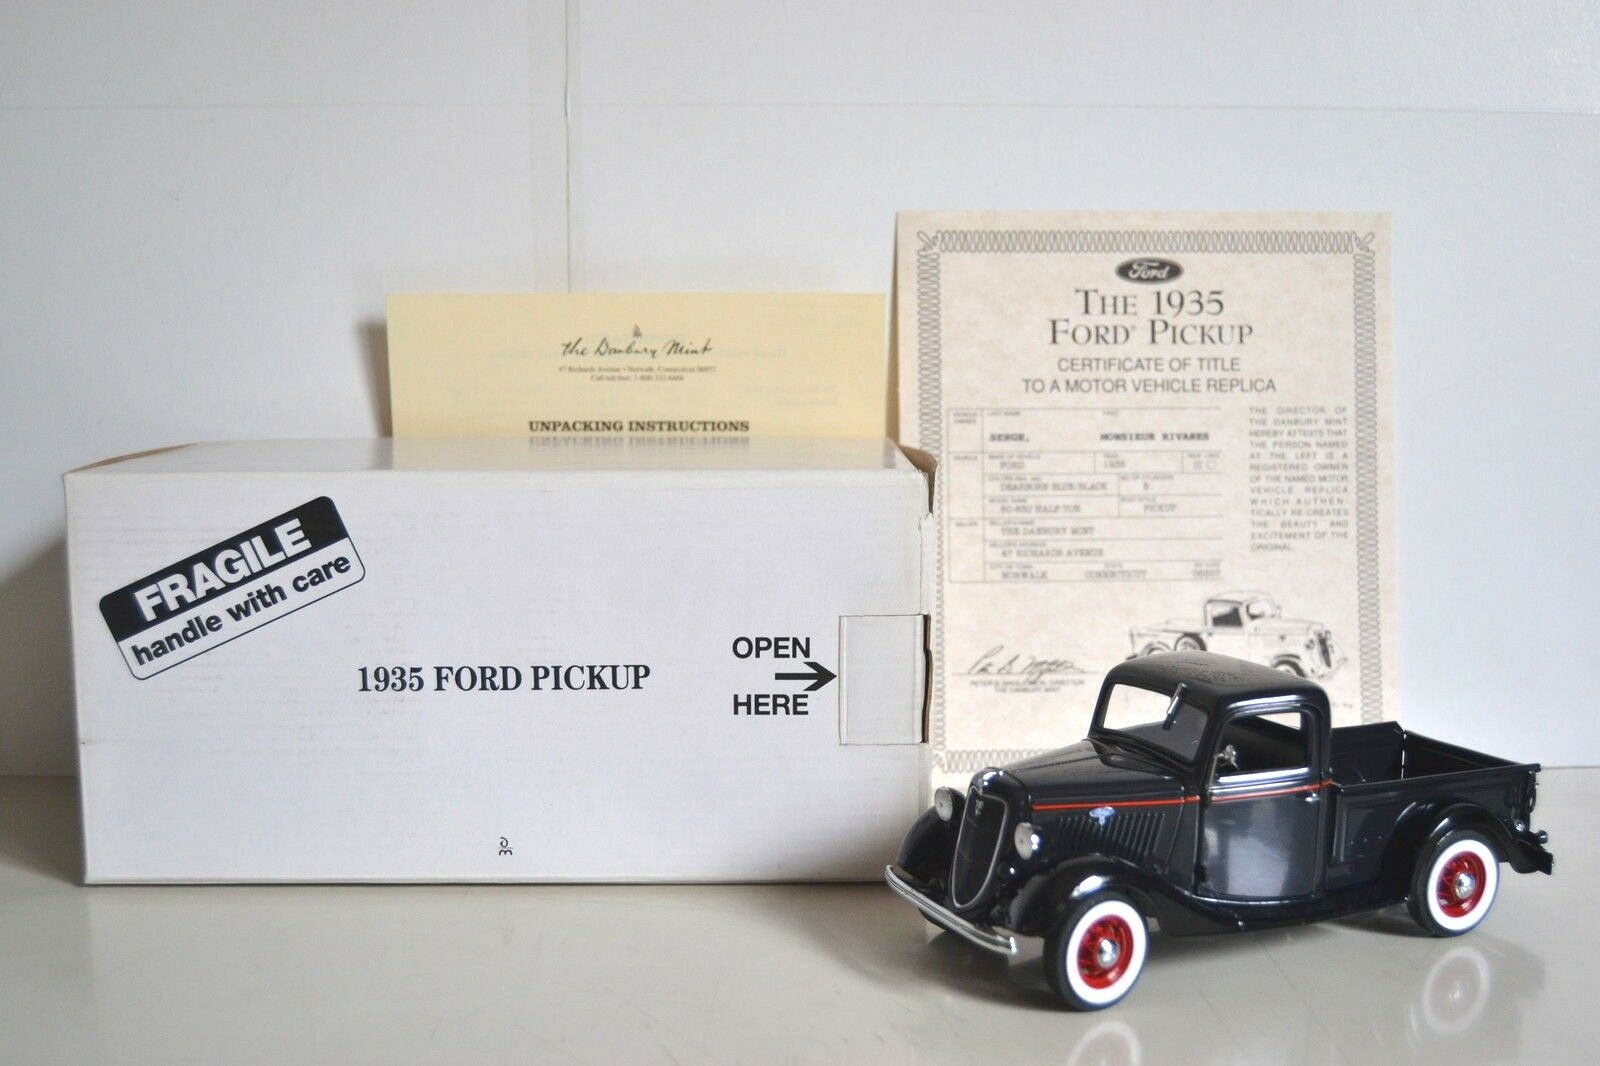 preferente Danbury Mint 1 24 Ford 50-830 1940 Pickup Pickup Pickup  Half-Ton . Réf. DM026.  Tu satisfacción es nuestro objetivo